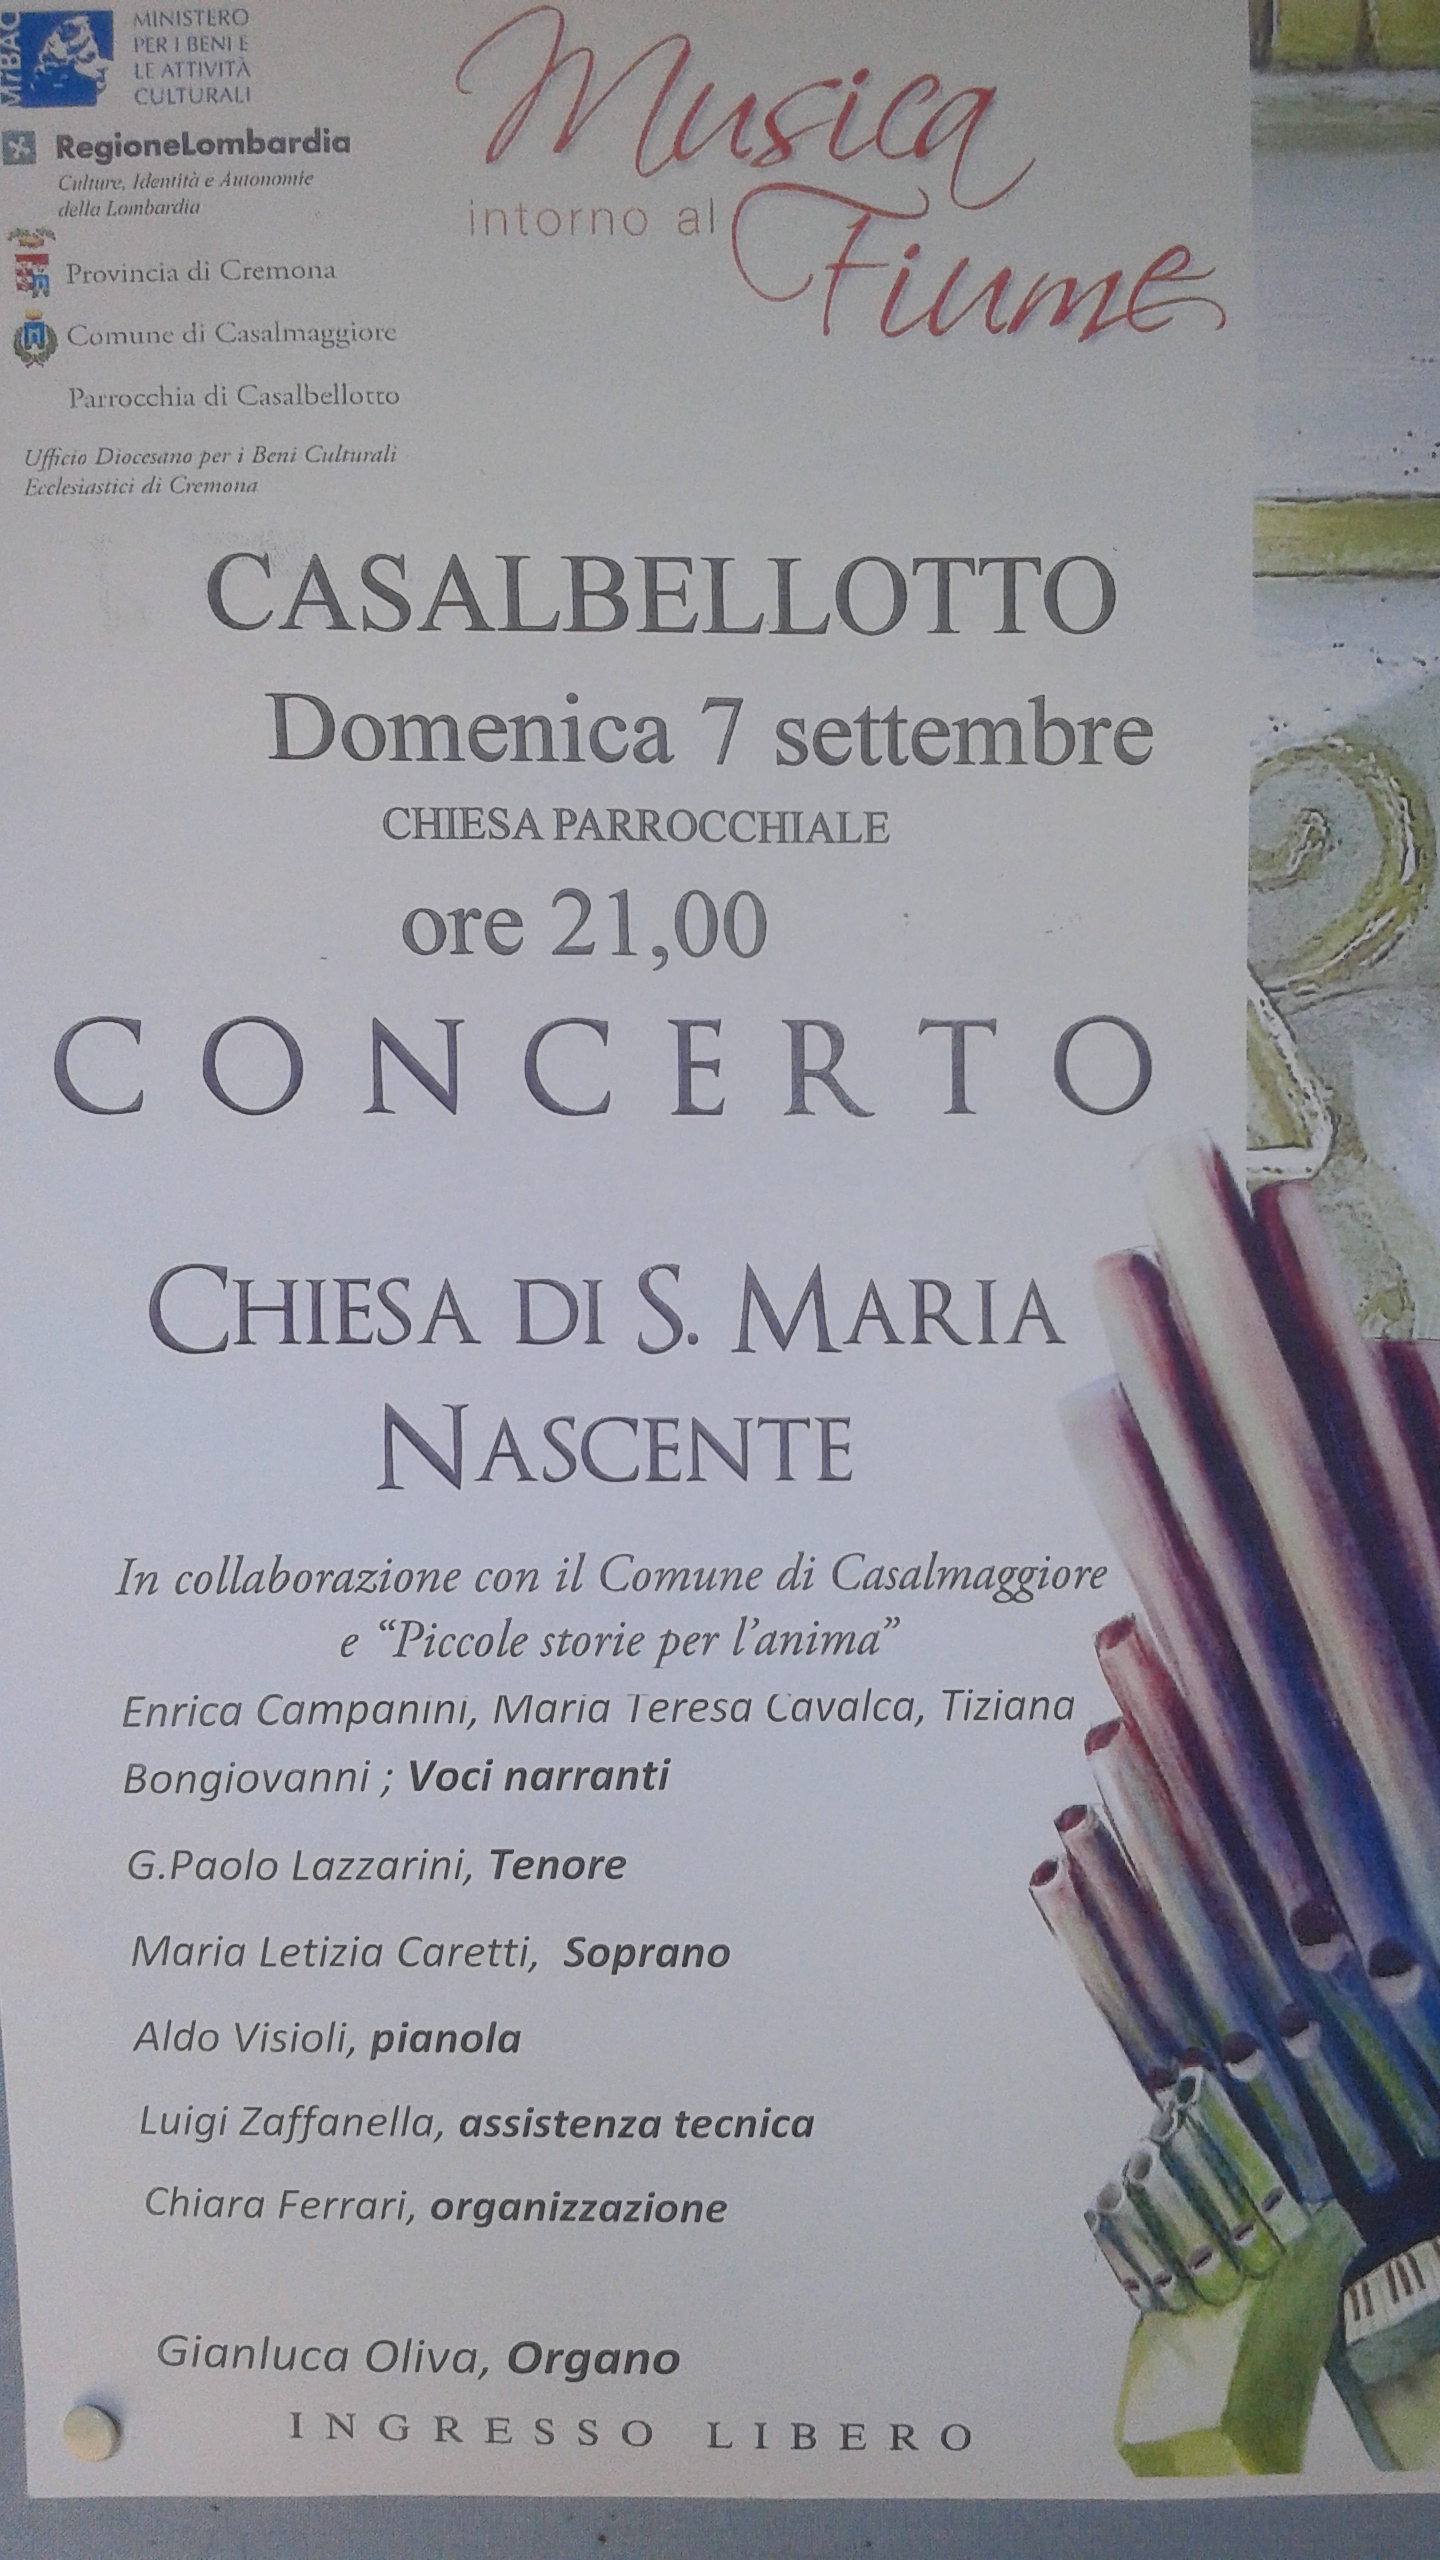 MUSICA INTORNO AL FIUME: CONCERTO D'ORGANO A CASALBELLOTTO